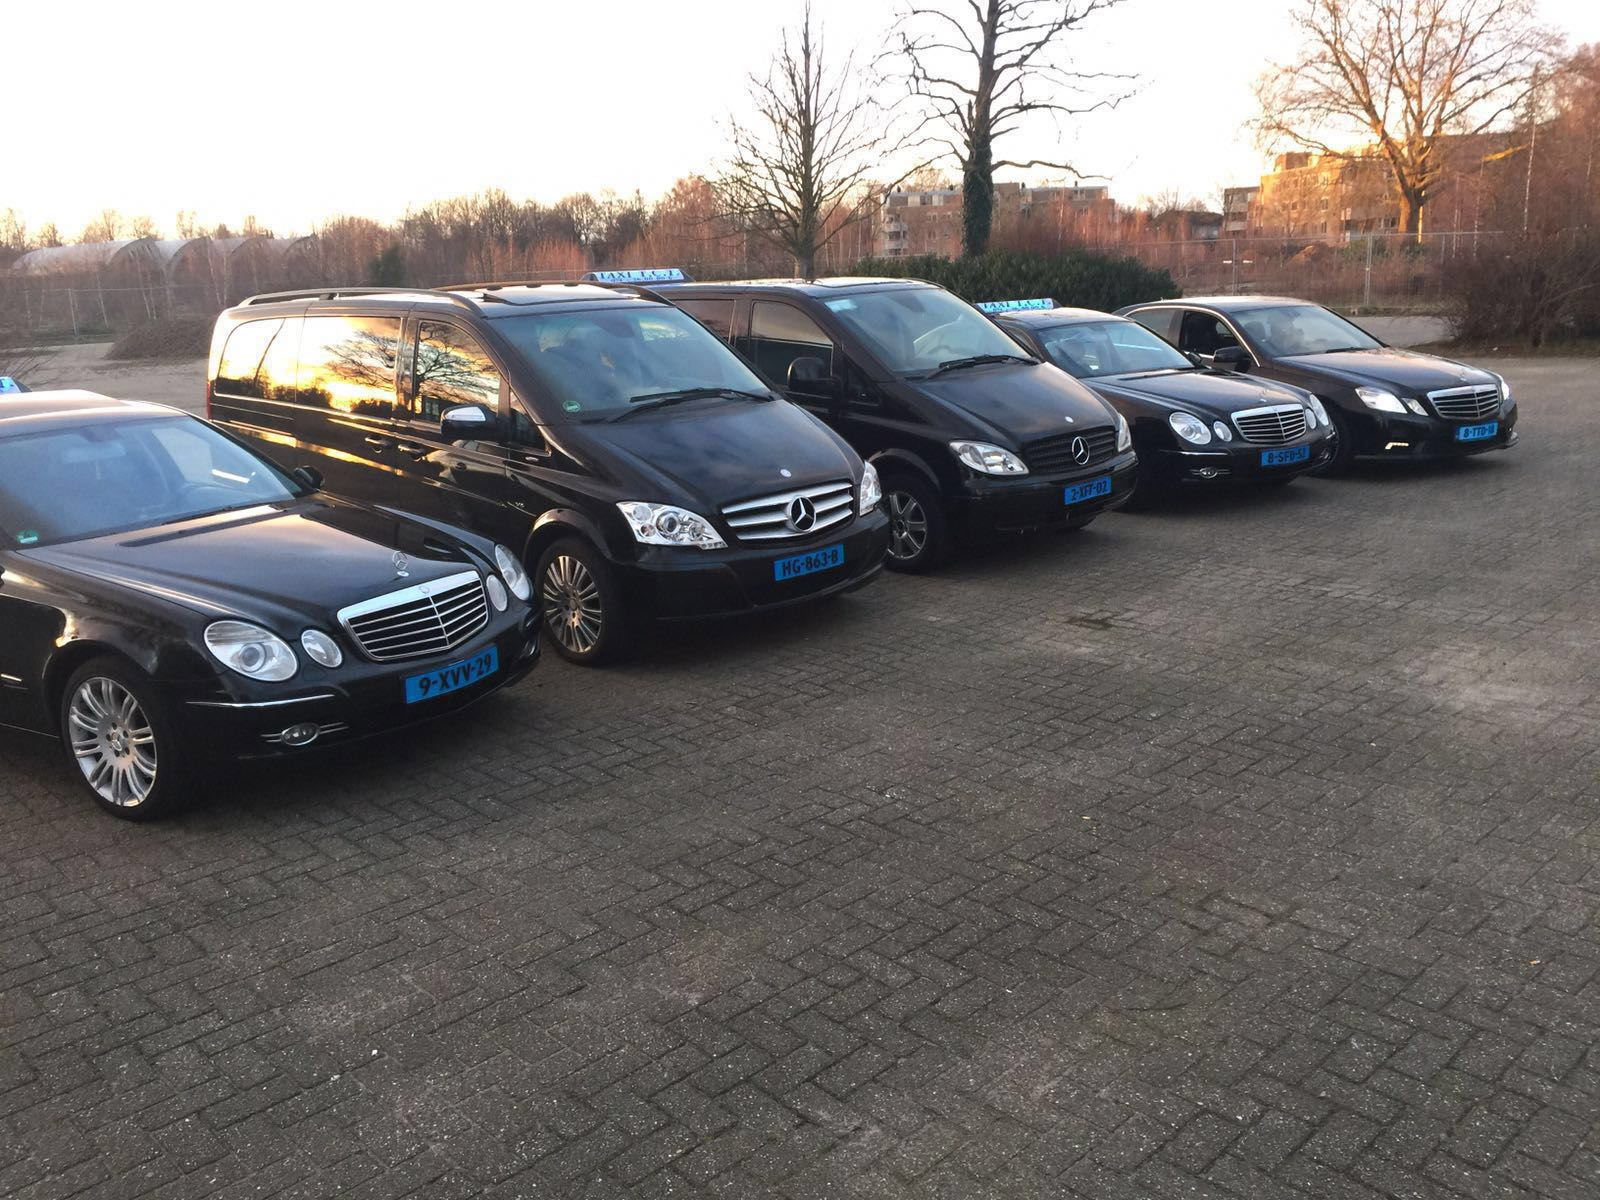 Taxi-Hengelo-Taxi-TCT